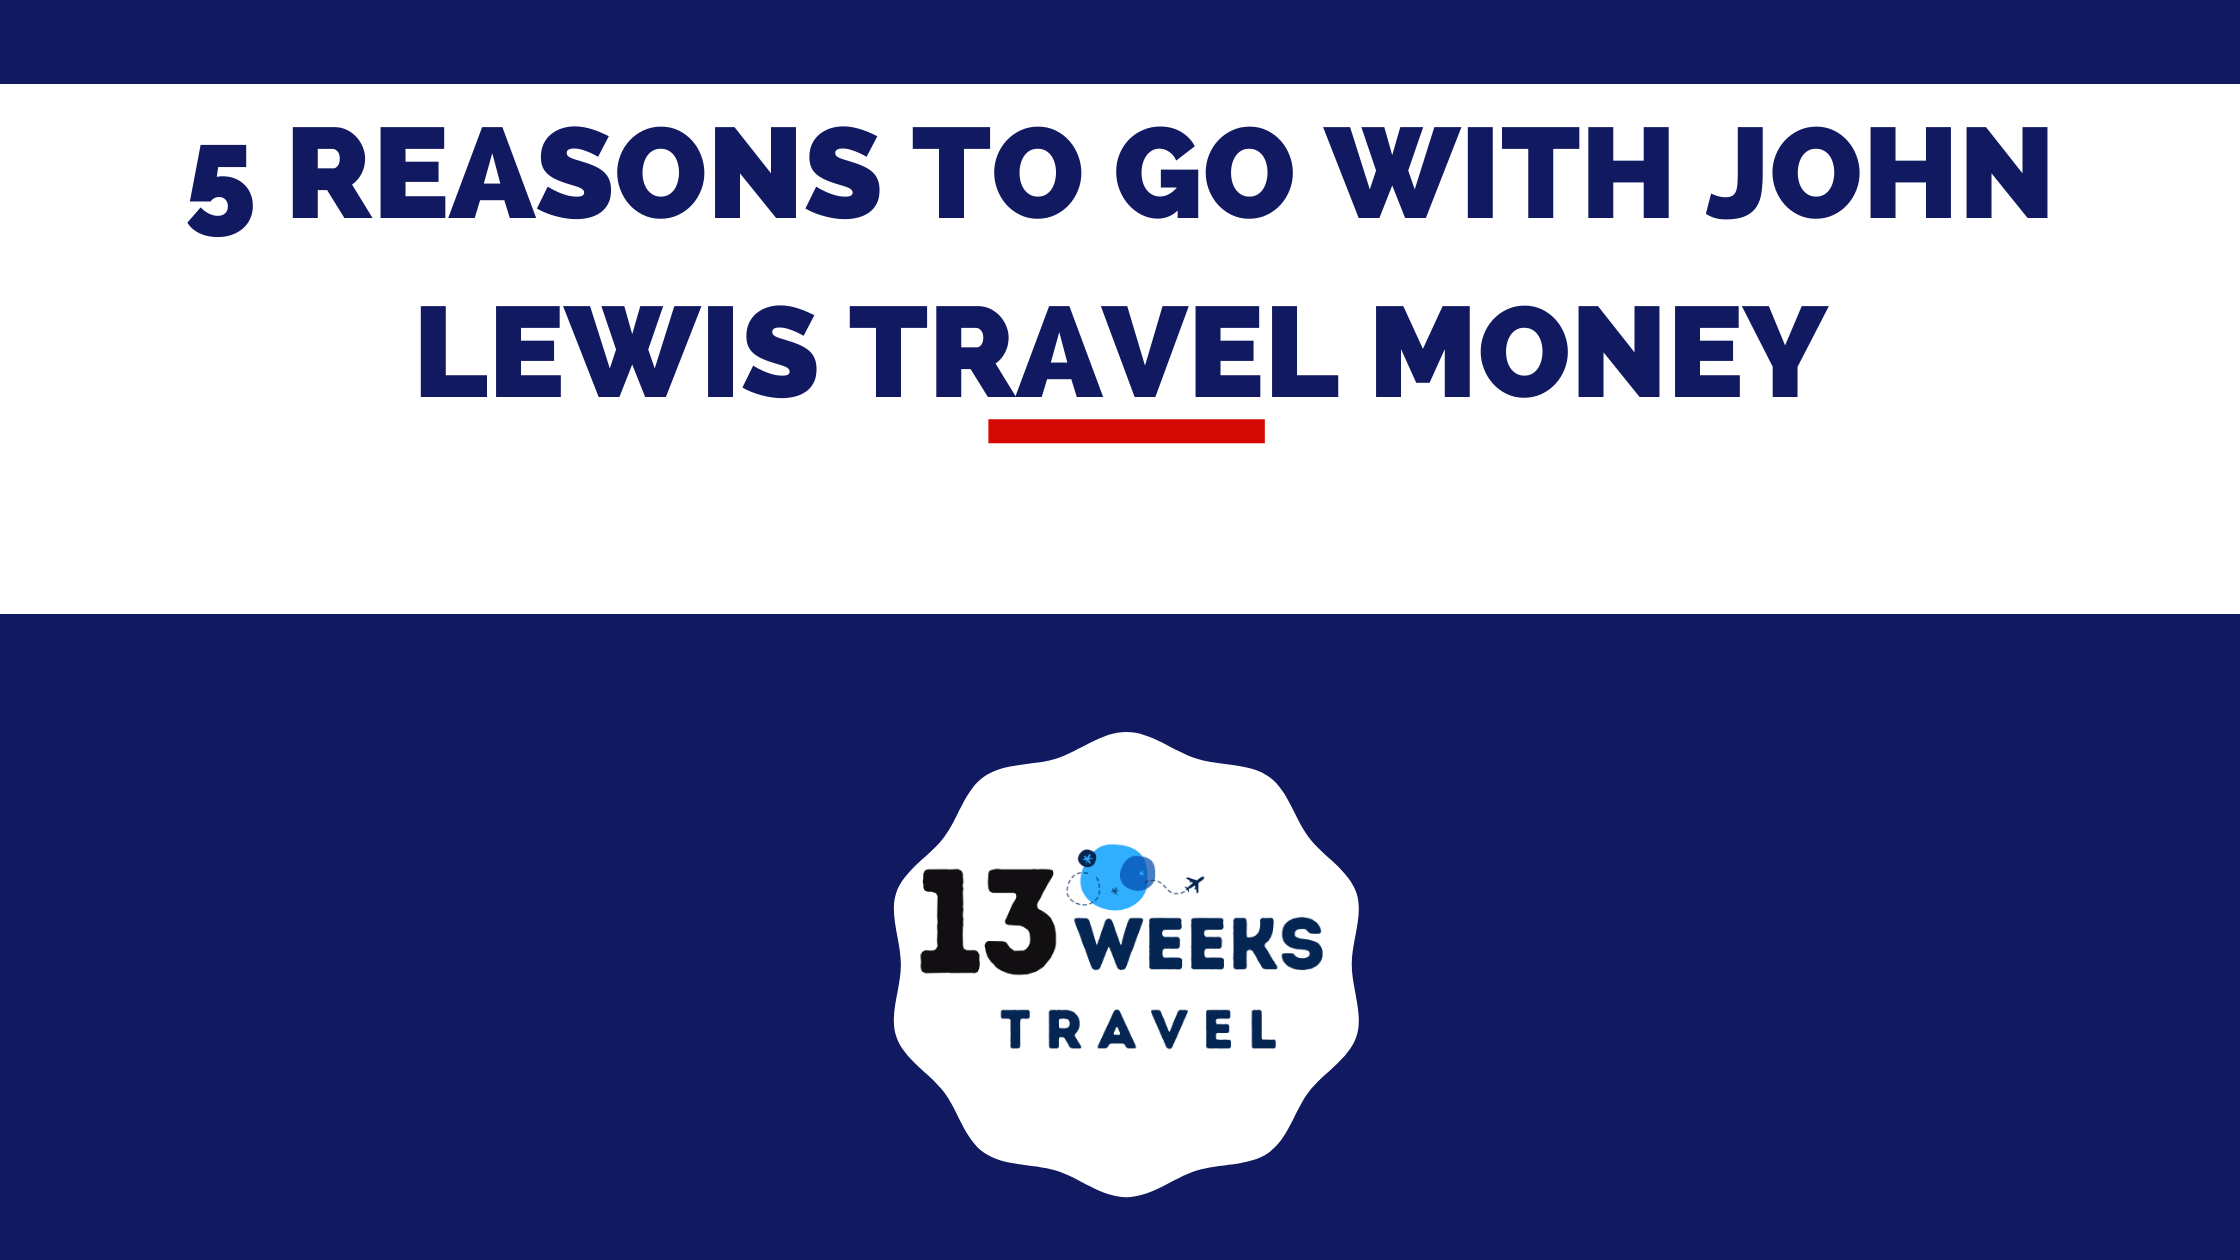 5 Reasons to go with John Lewis Travel Money bp